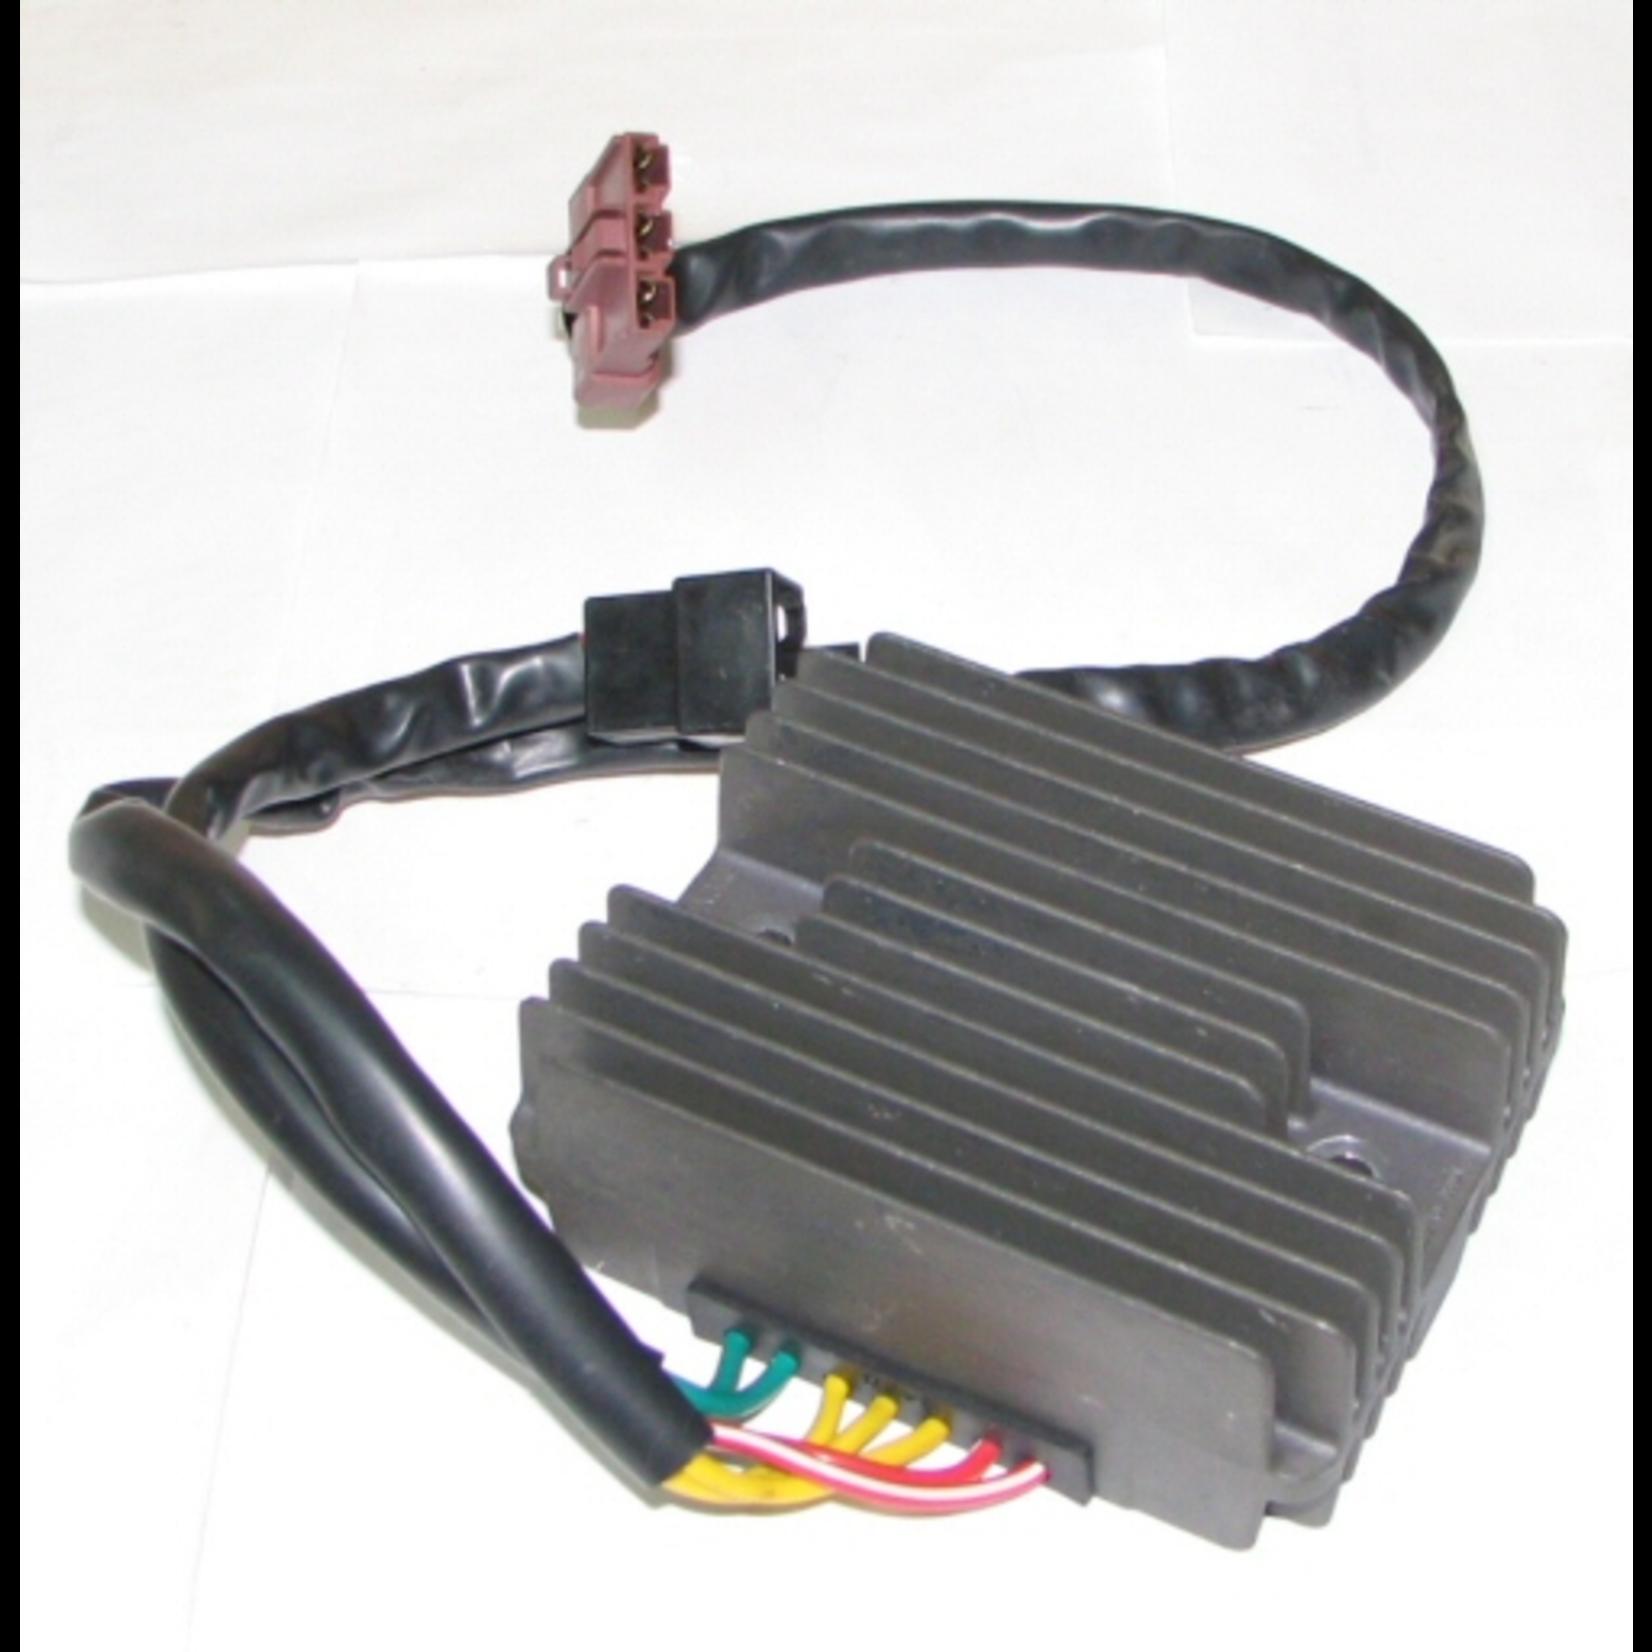 Parts Voltage Regulator, GTS/X9 (639110)